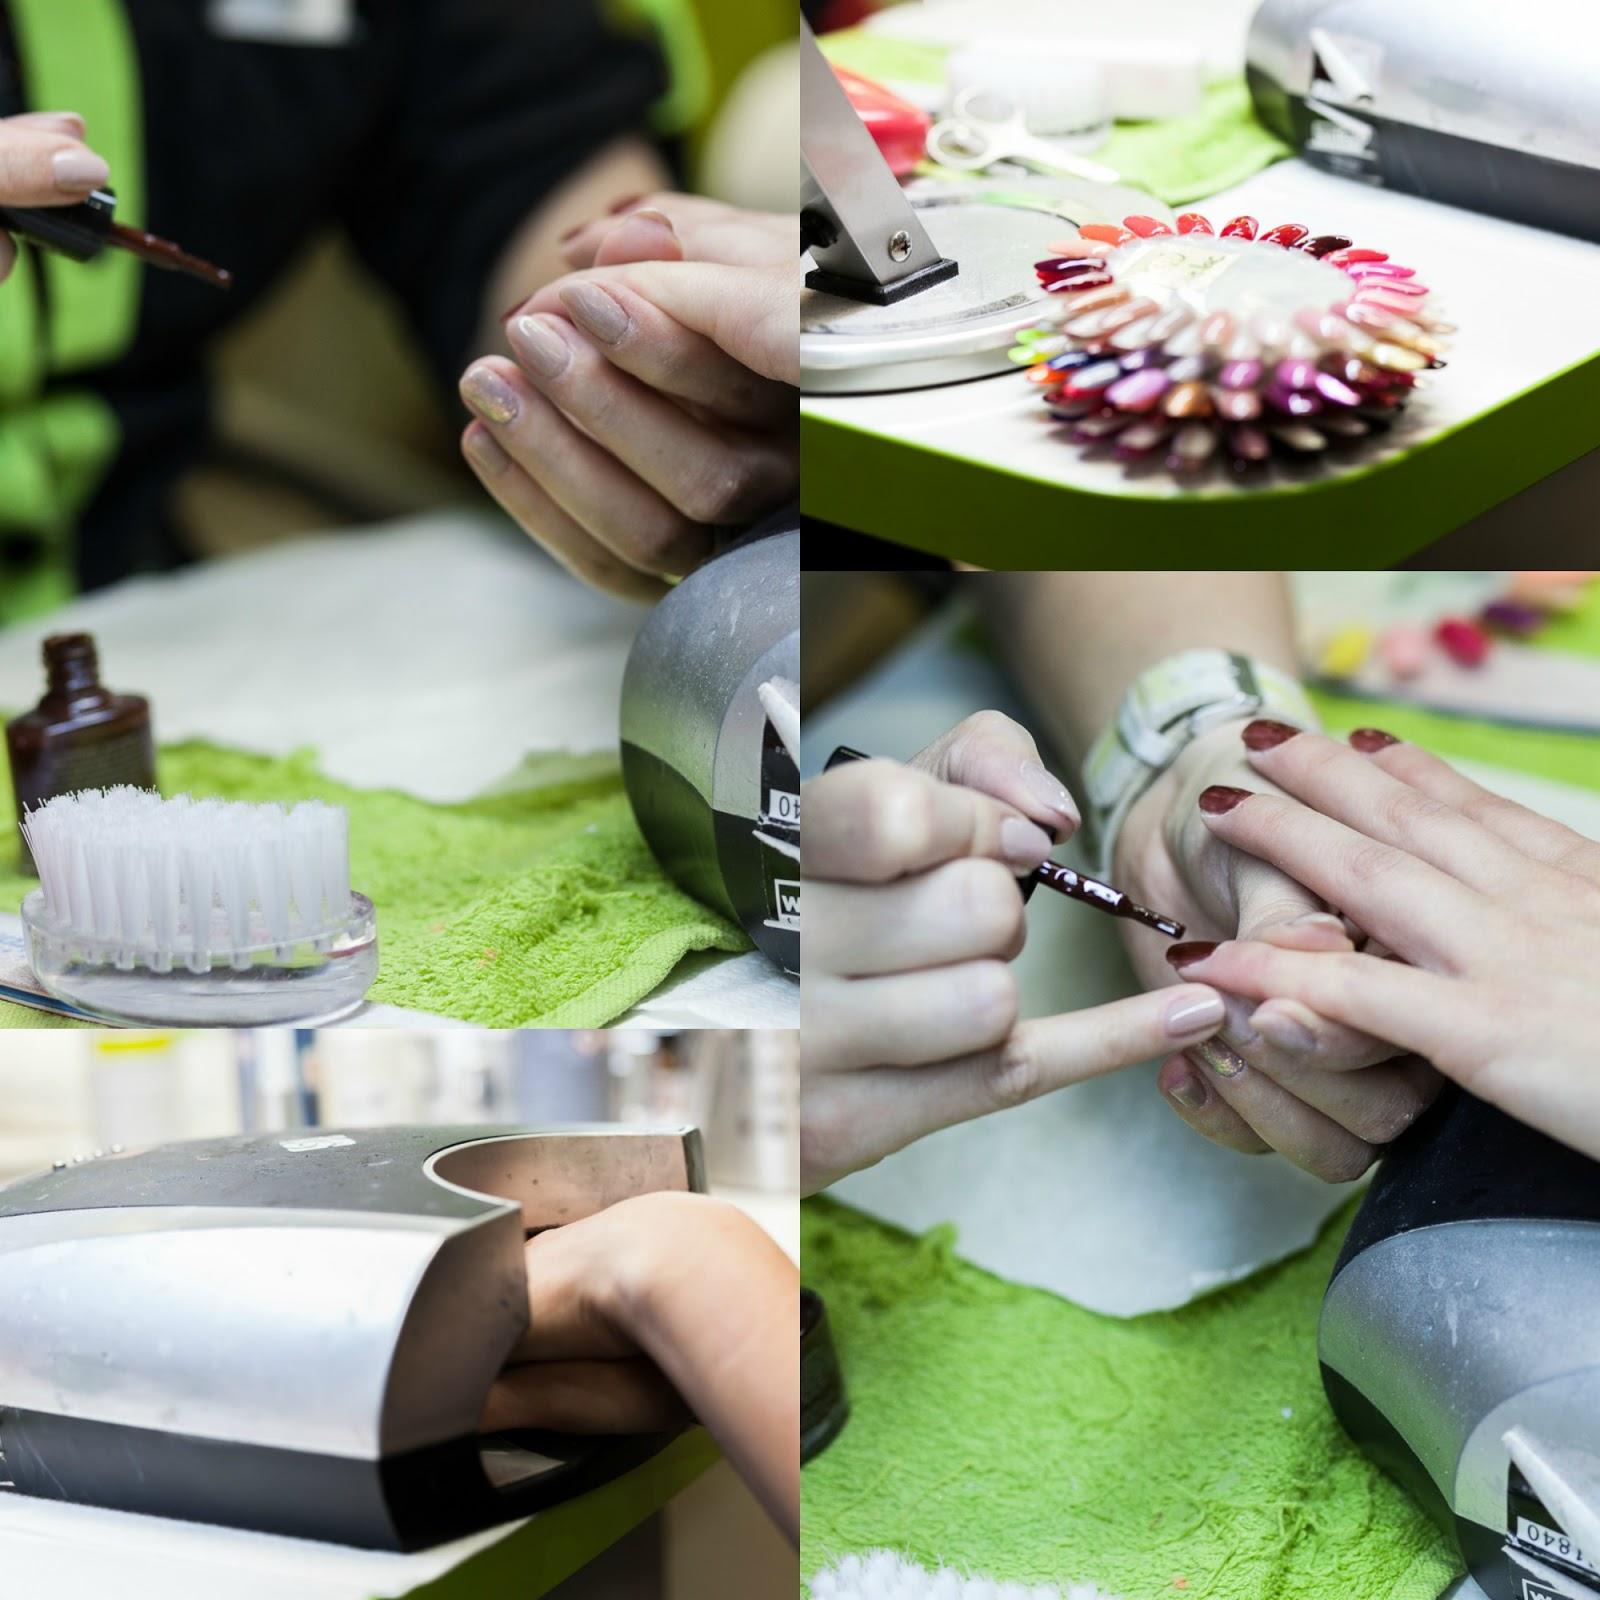 shellack manicure